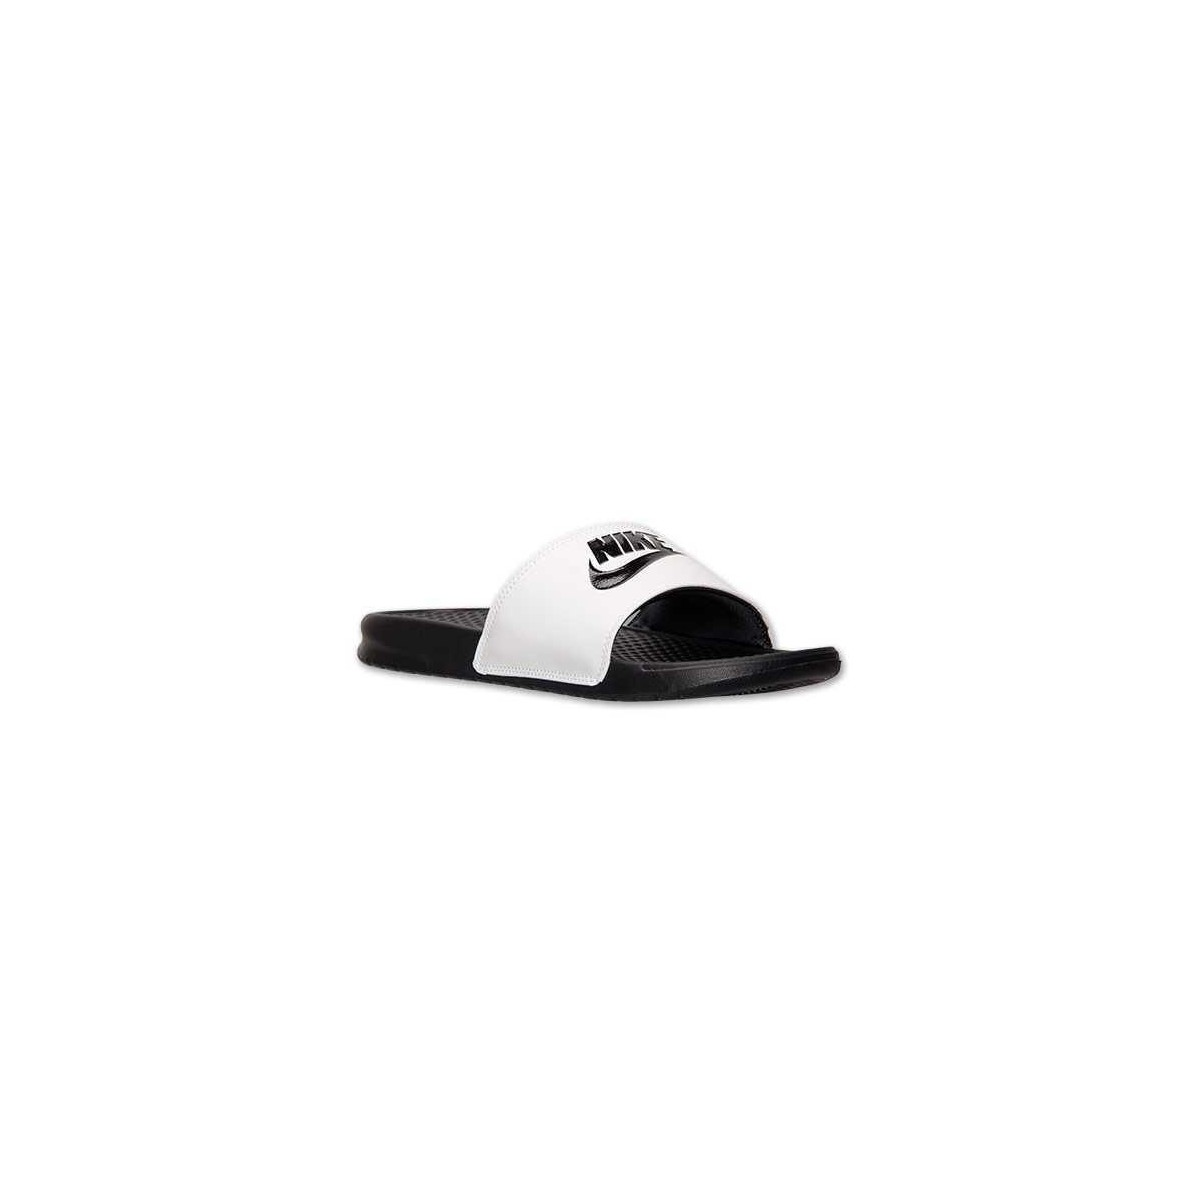 Nike benassi jdi chanclas hombre 343880 100 blancas 3j6qxmPEd